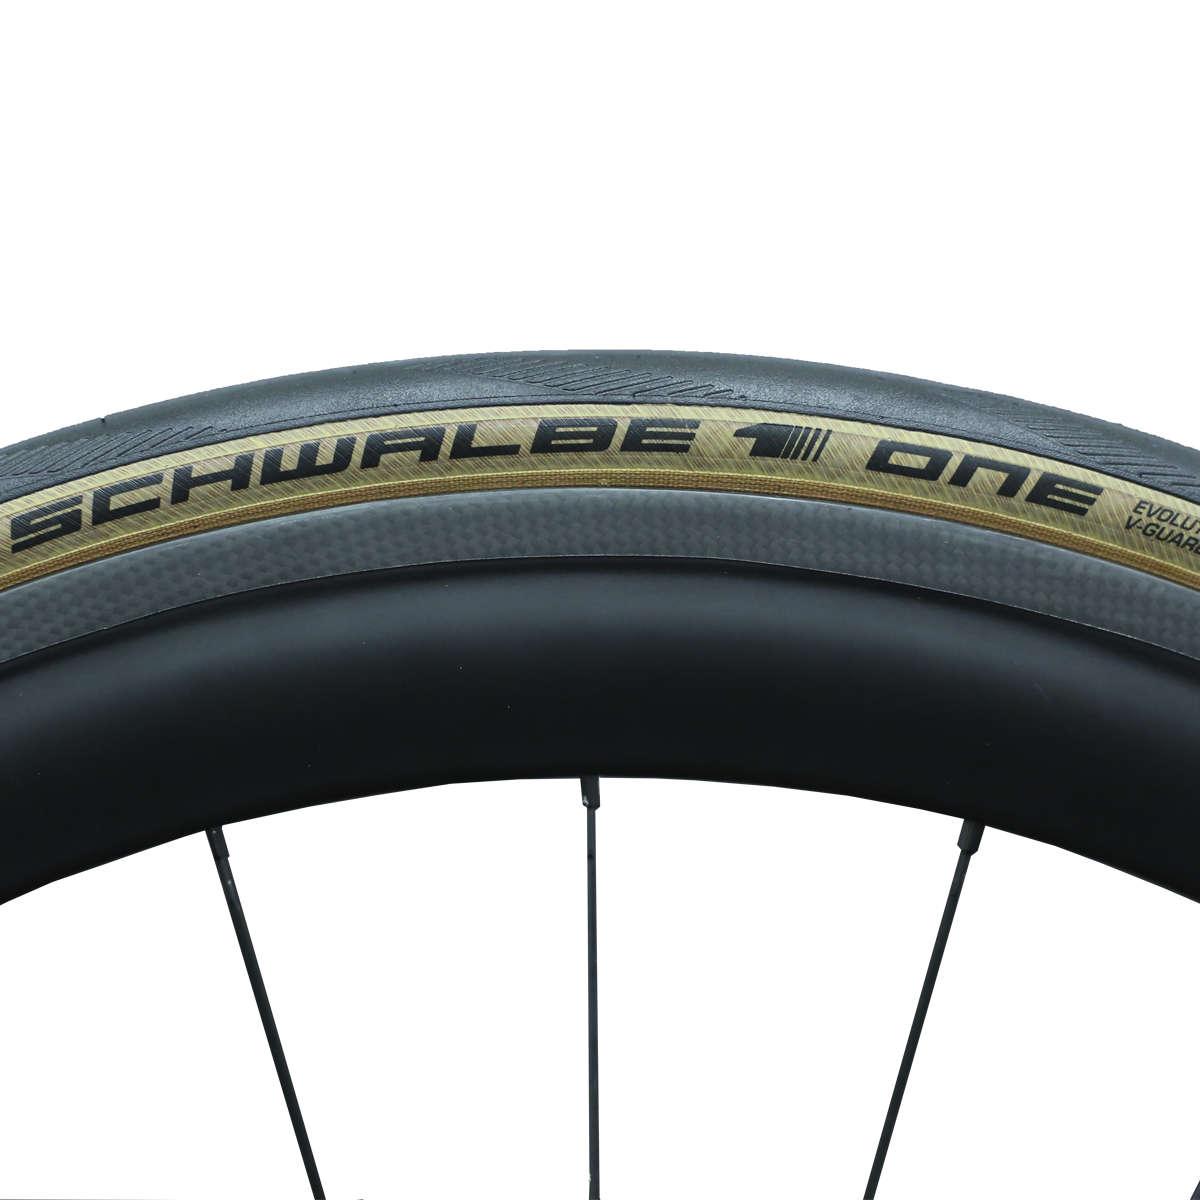 Schwalbe One Limited Edition Race Vouwband 700 X 25c Zwart Beige Pro 25 C